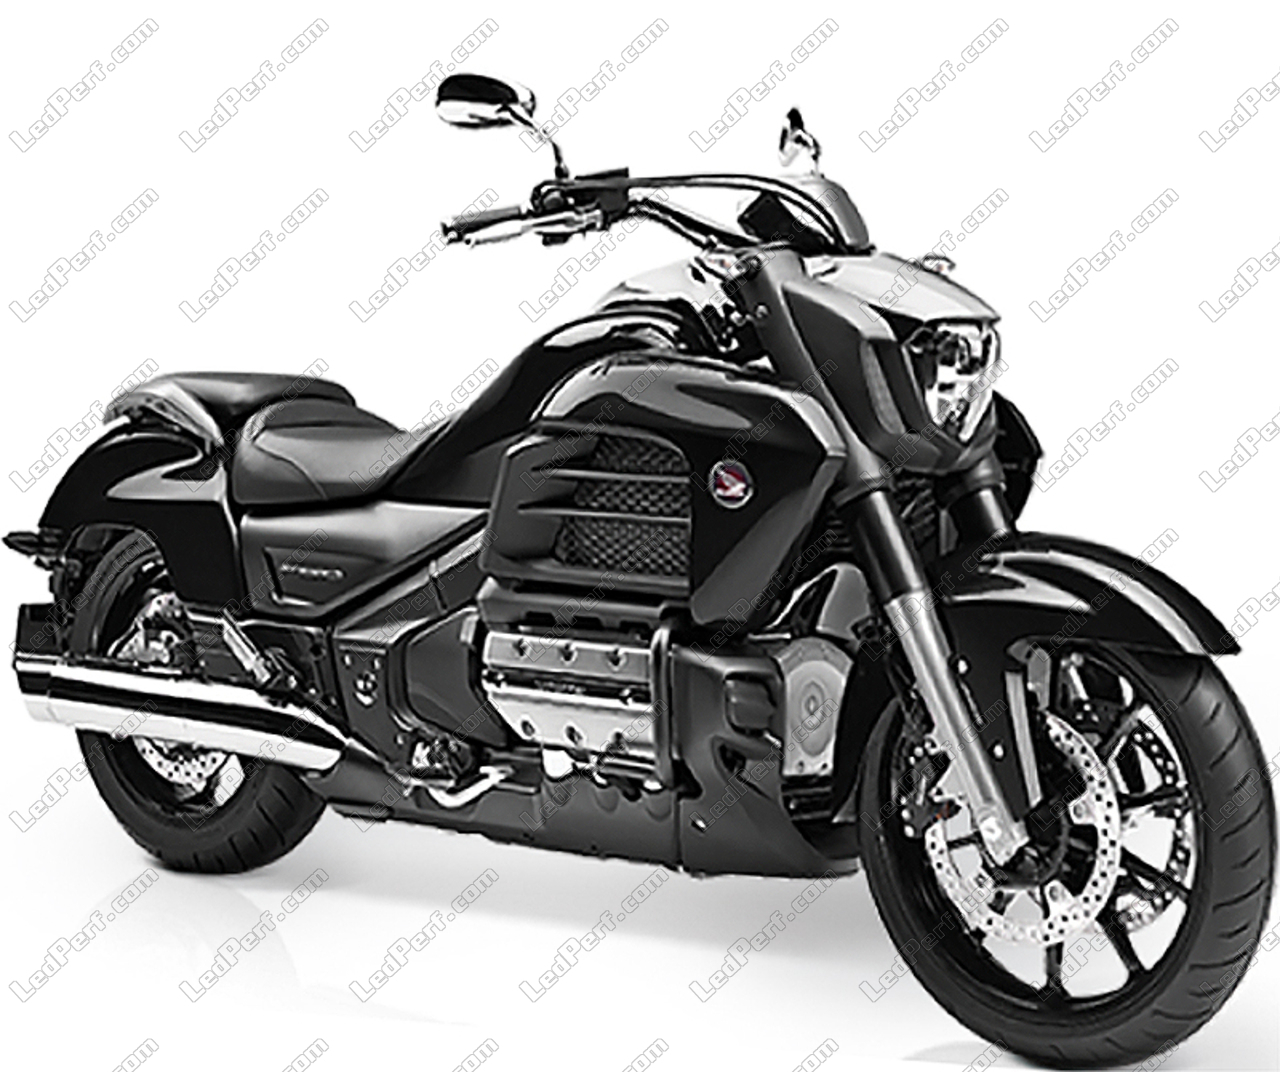 phares additionnels led pour moto honda goldwing 1800 f6c. Black Bedroom Furniture Sets. Home Design Ideas